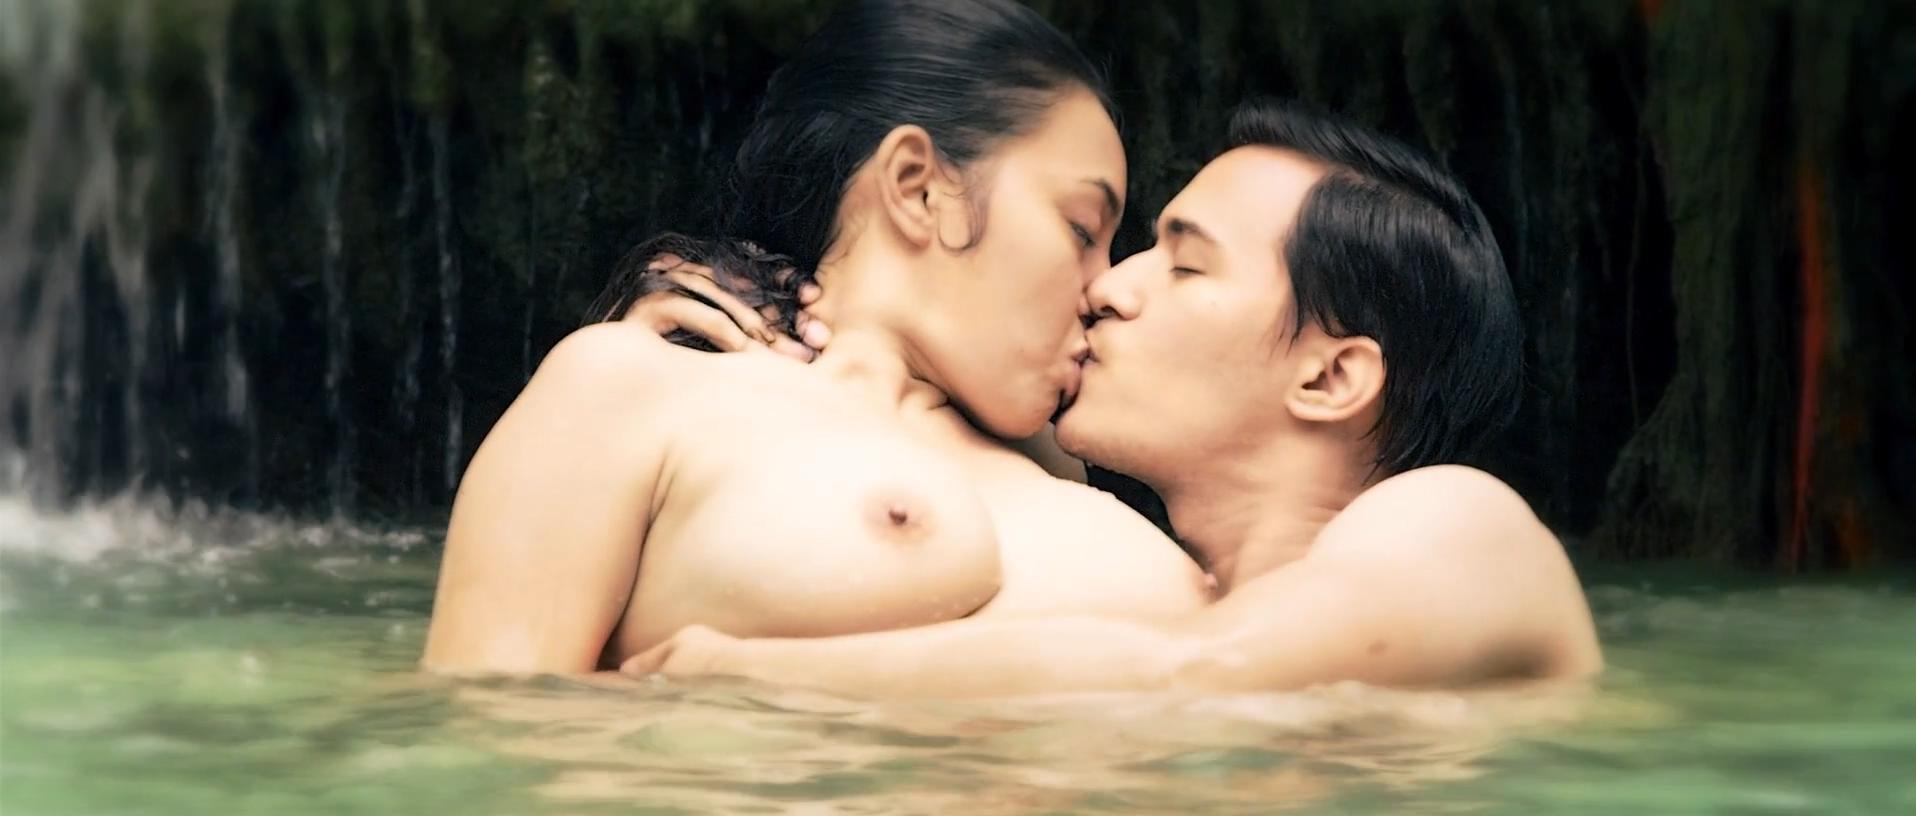 thai-porr-movie-sexy-naked-women-in-a-circle